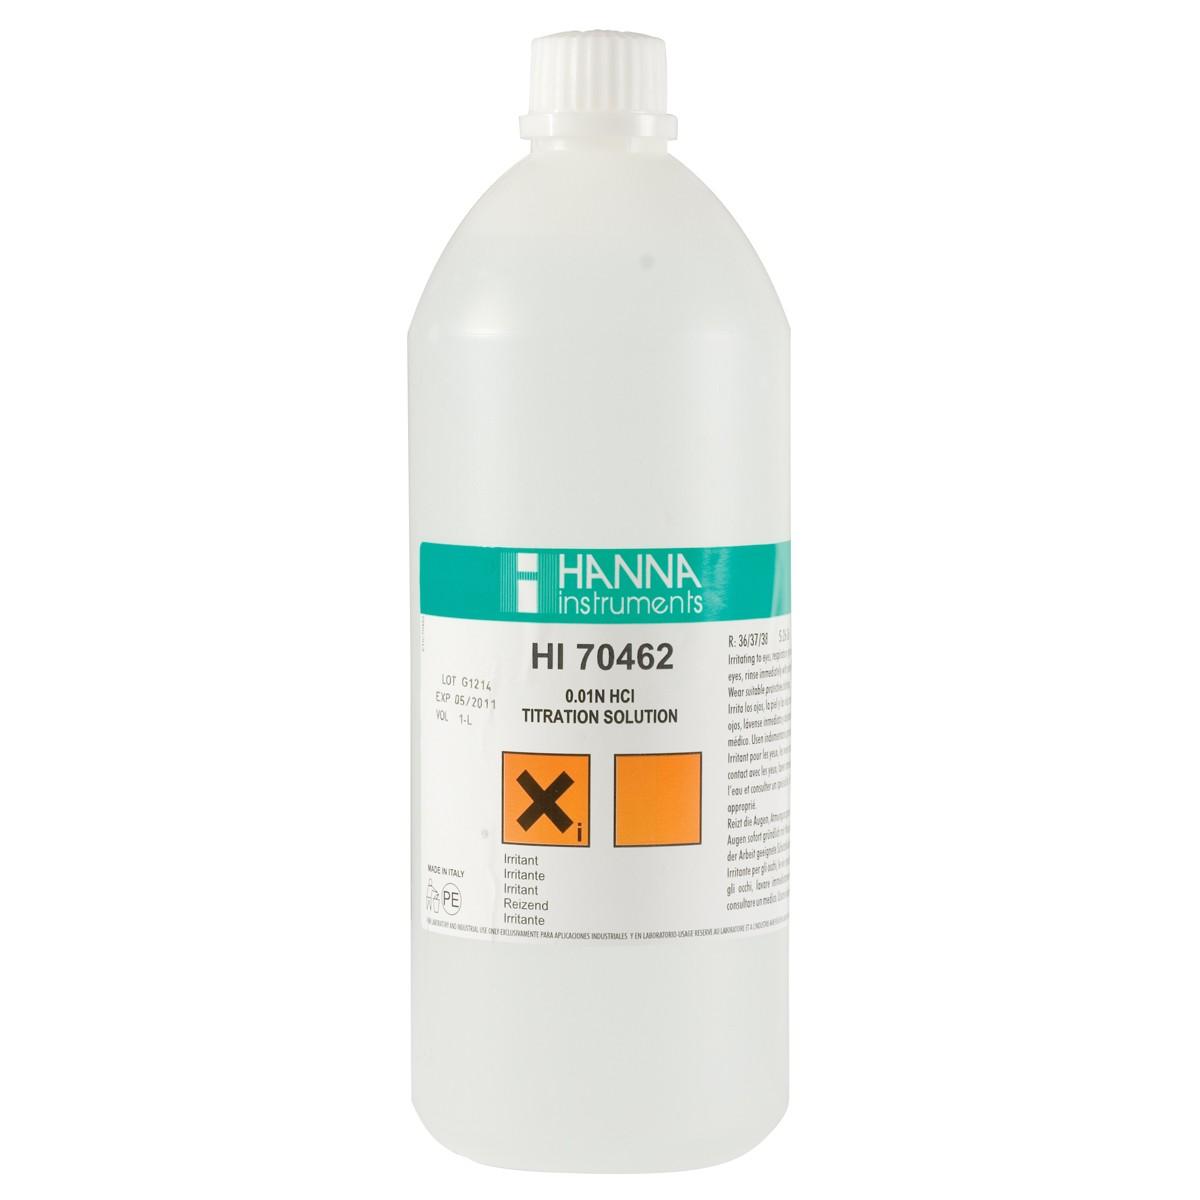 Hydrochloric Acid 0.01N, 1L - HI70462